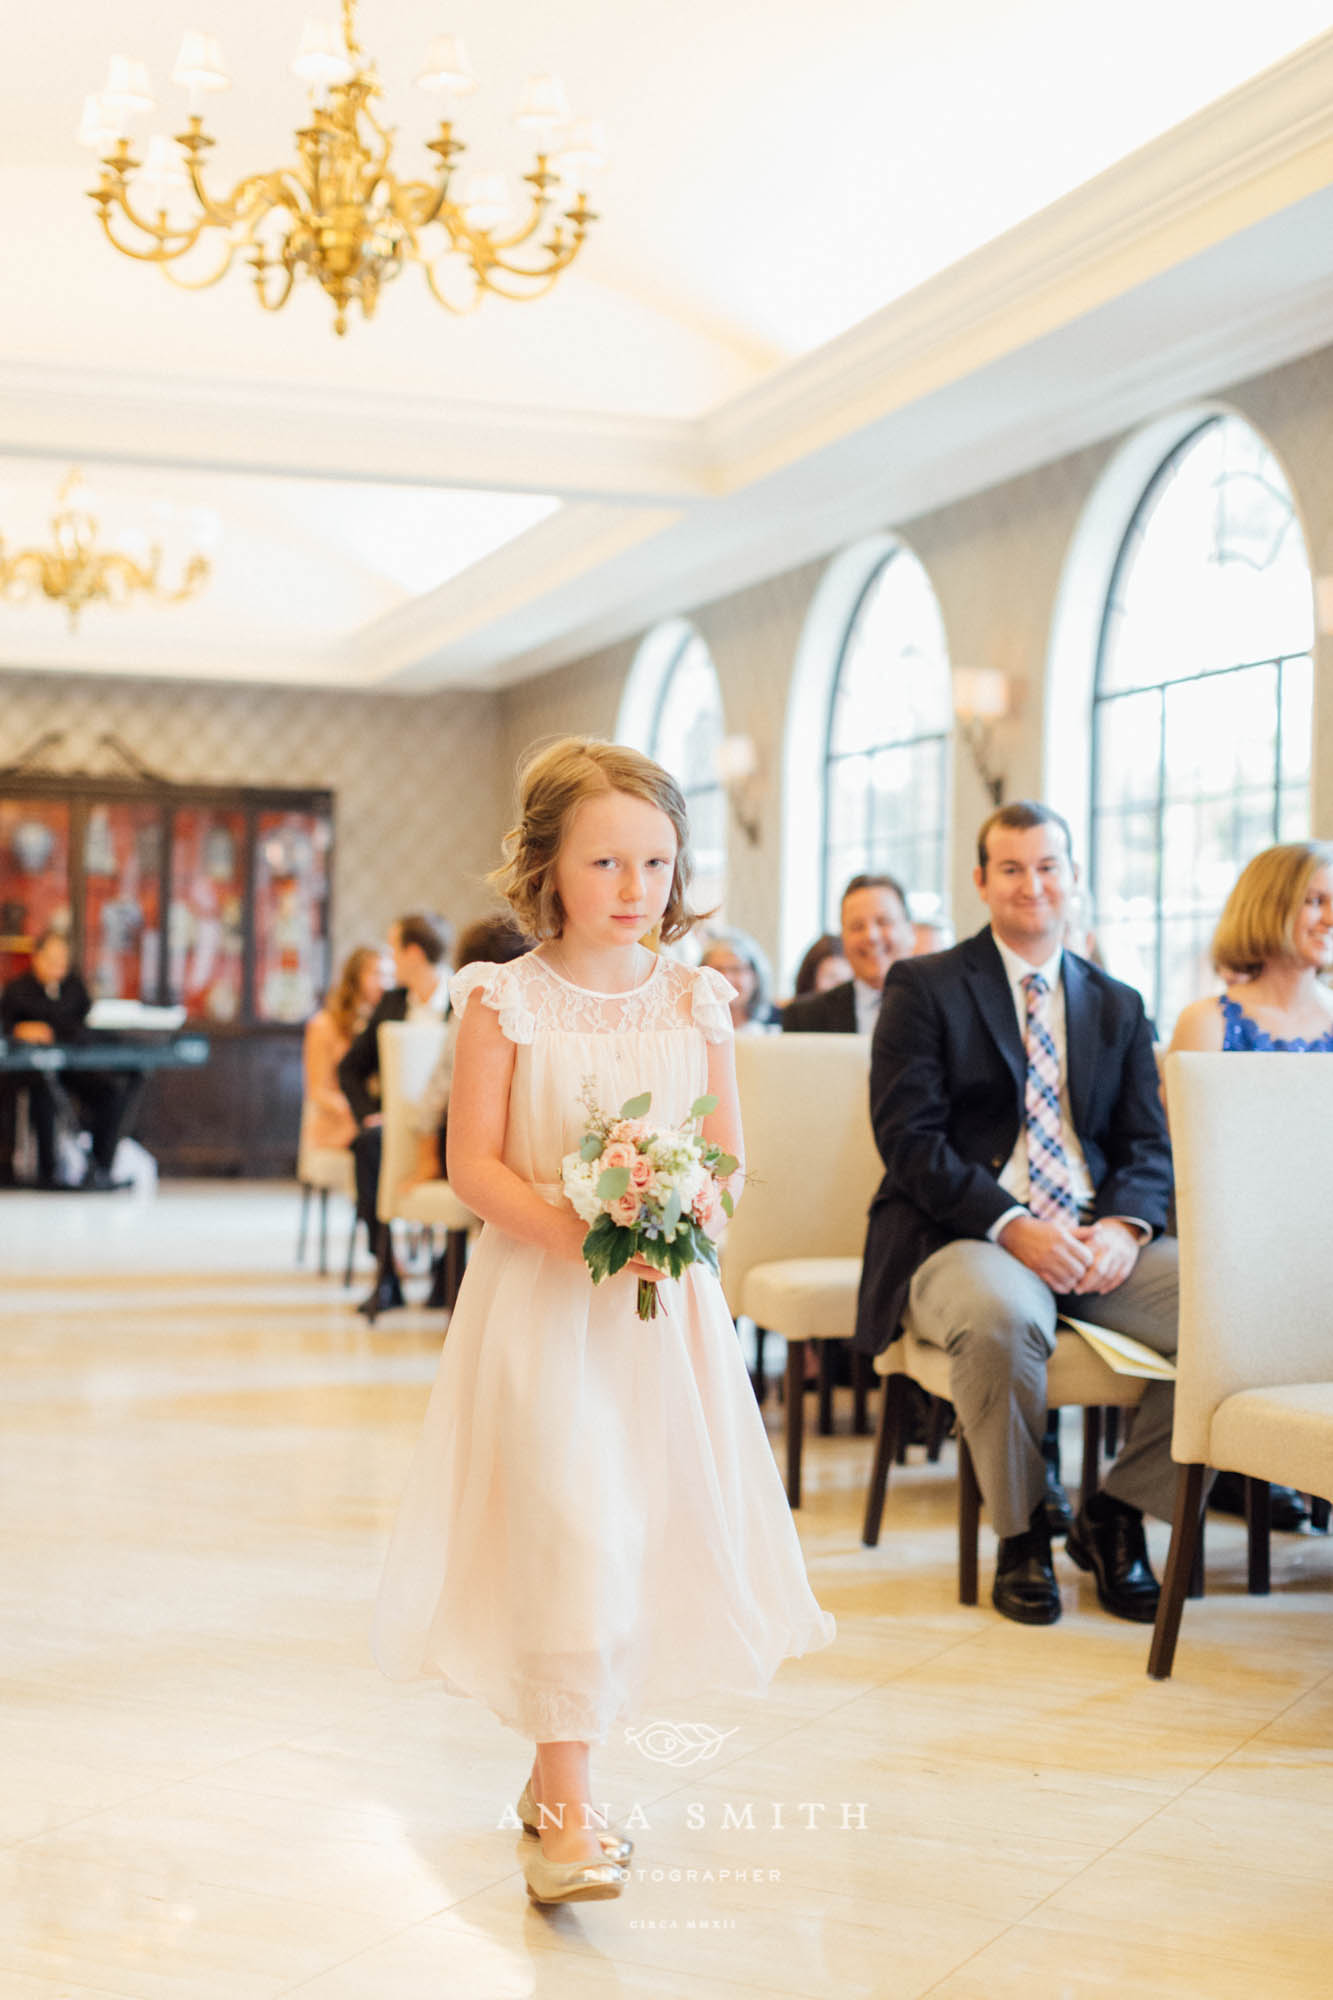 WEB 2016-6-W-CD-courtney brett the mansion on turtle creek wedding anna smith photography  (303 of 879).jpg